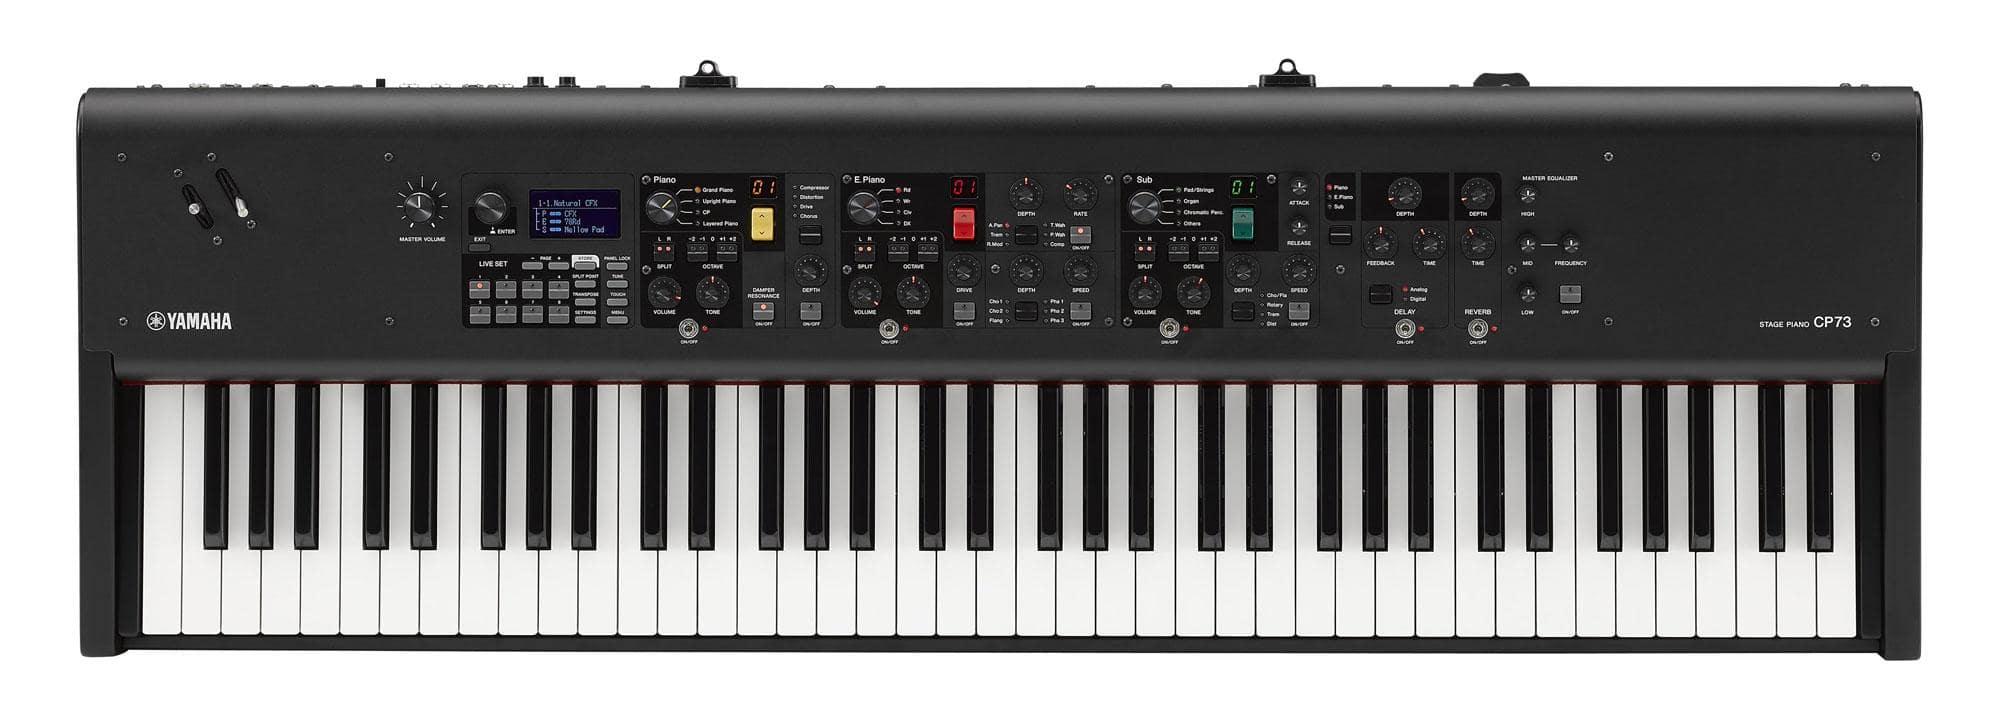 Stagepianos - Yamaha CP73 Stagepiano - Onlineshop Musikhaus Kirstein